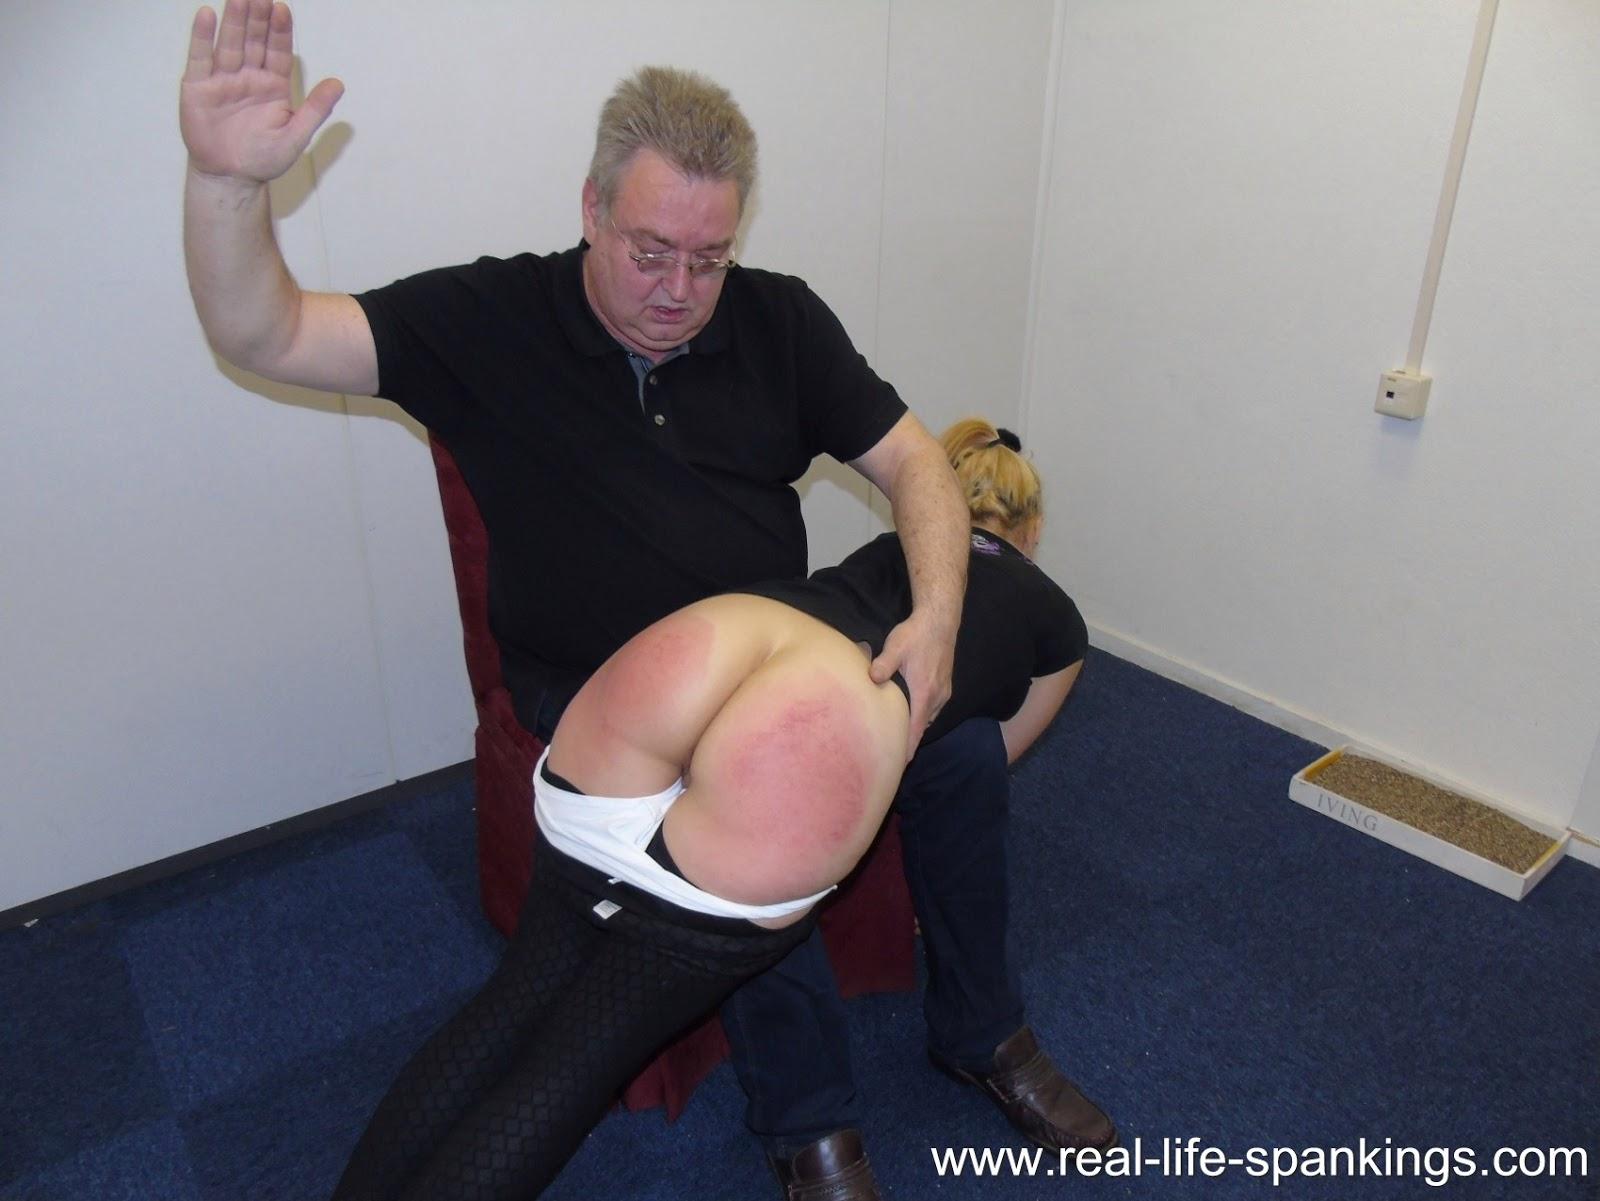 rose byrne porno image